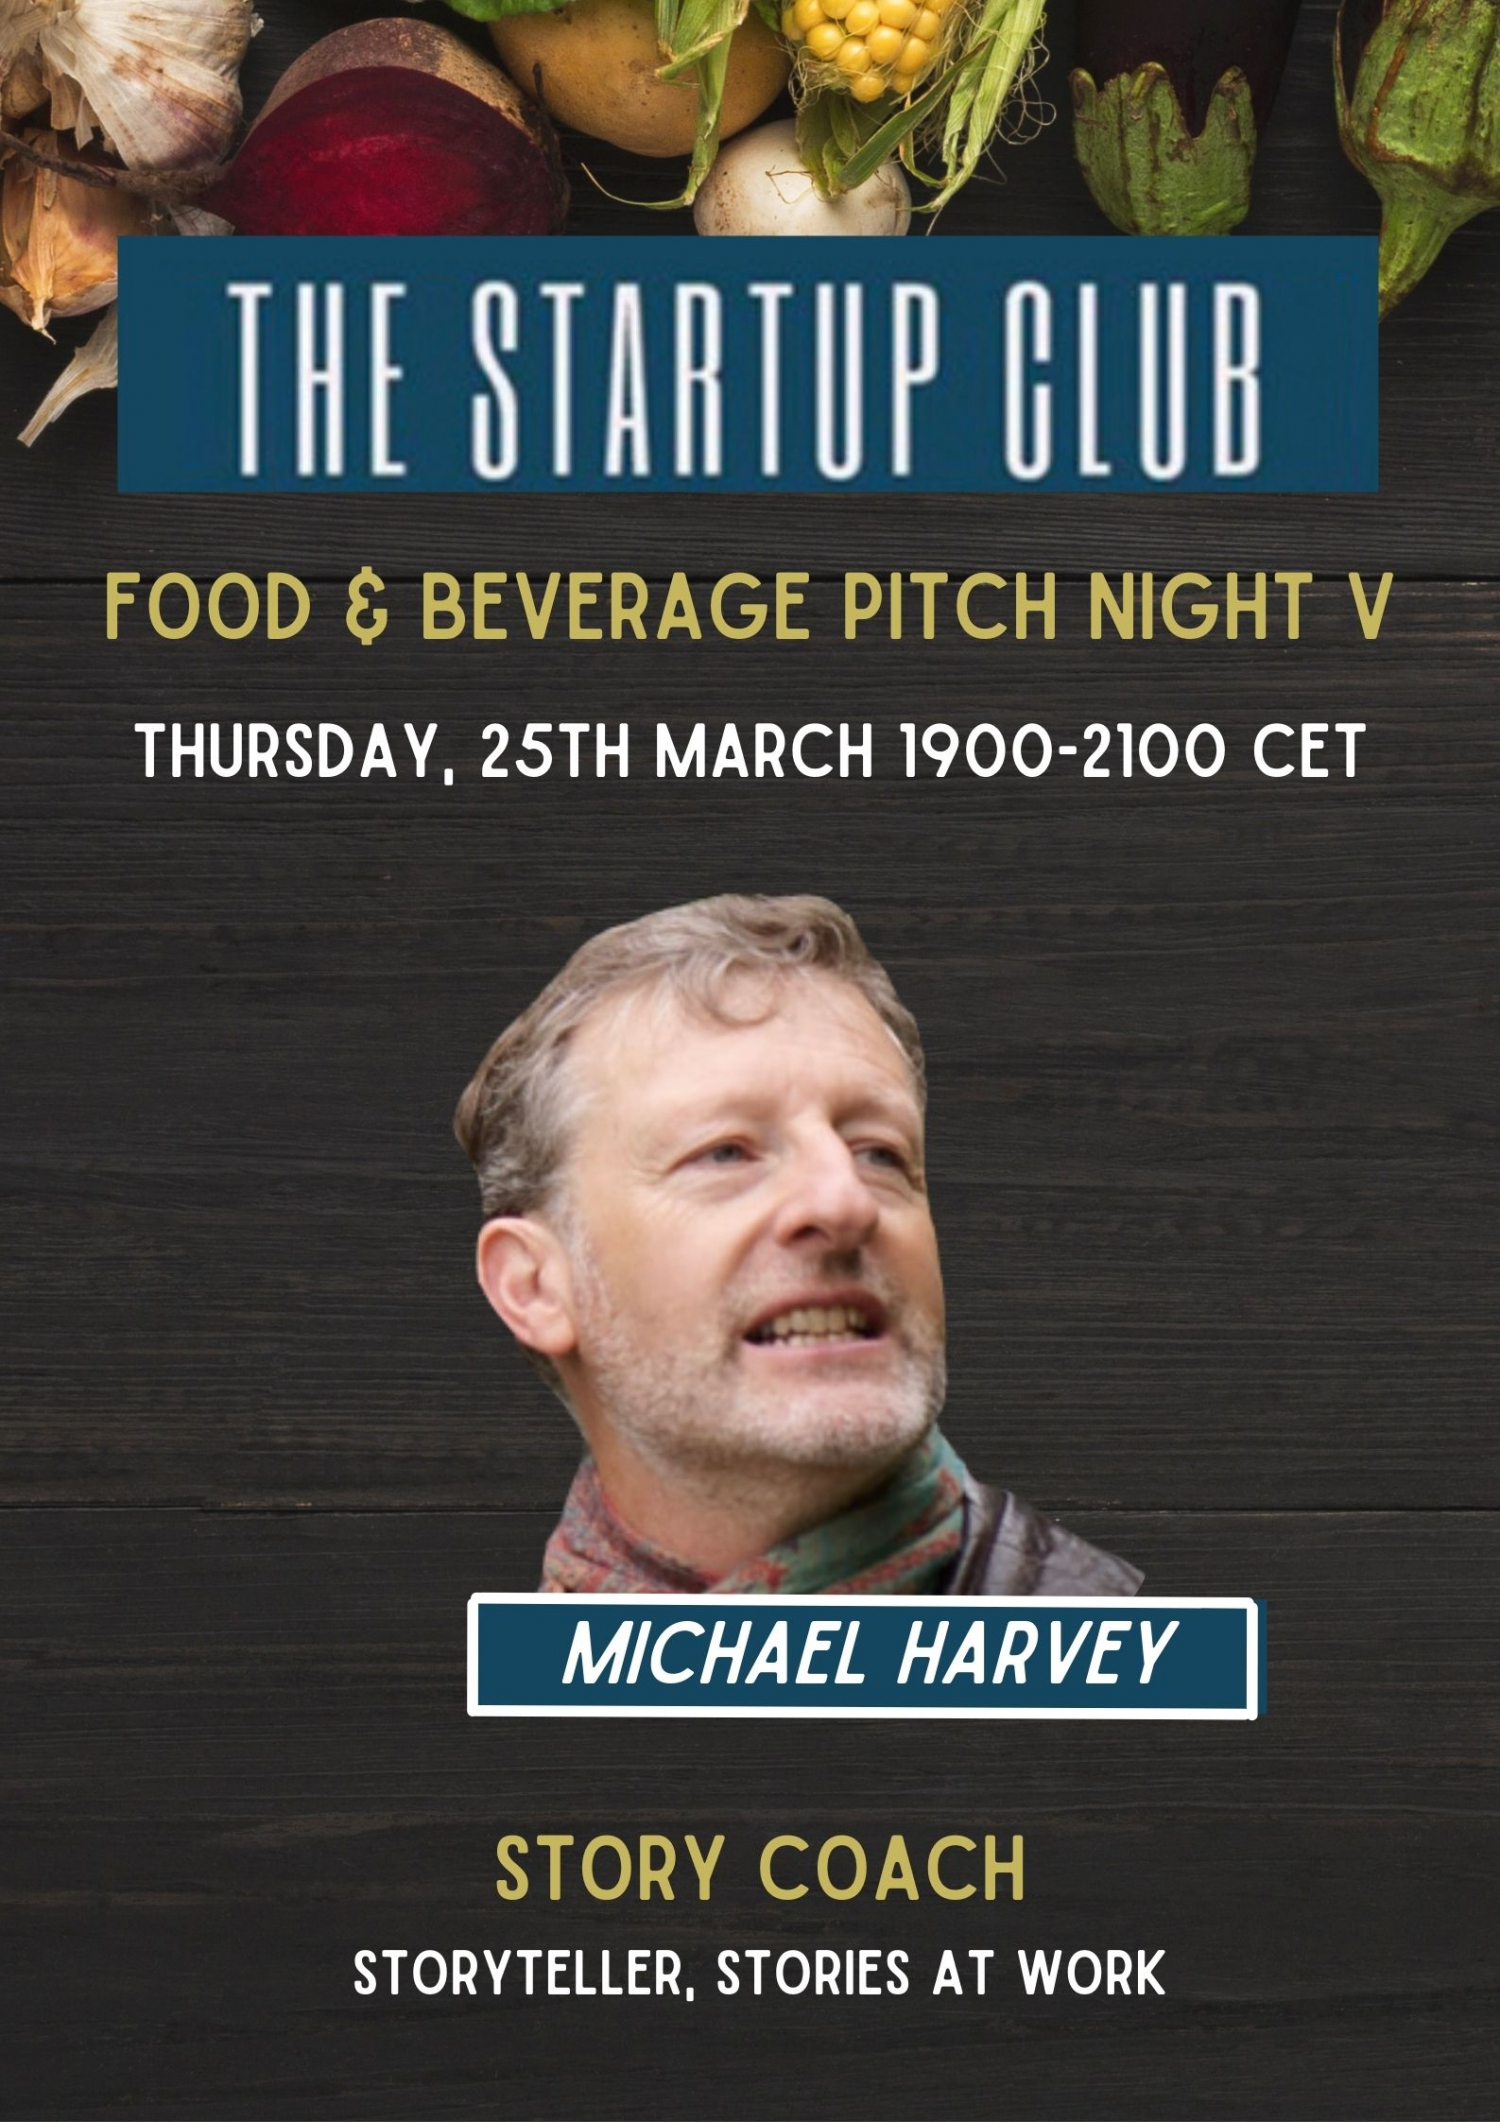 Food & Beverage Pitch Night V